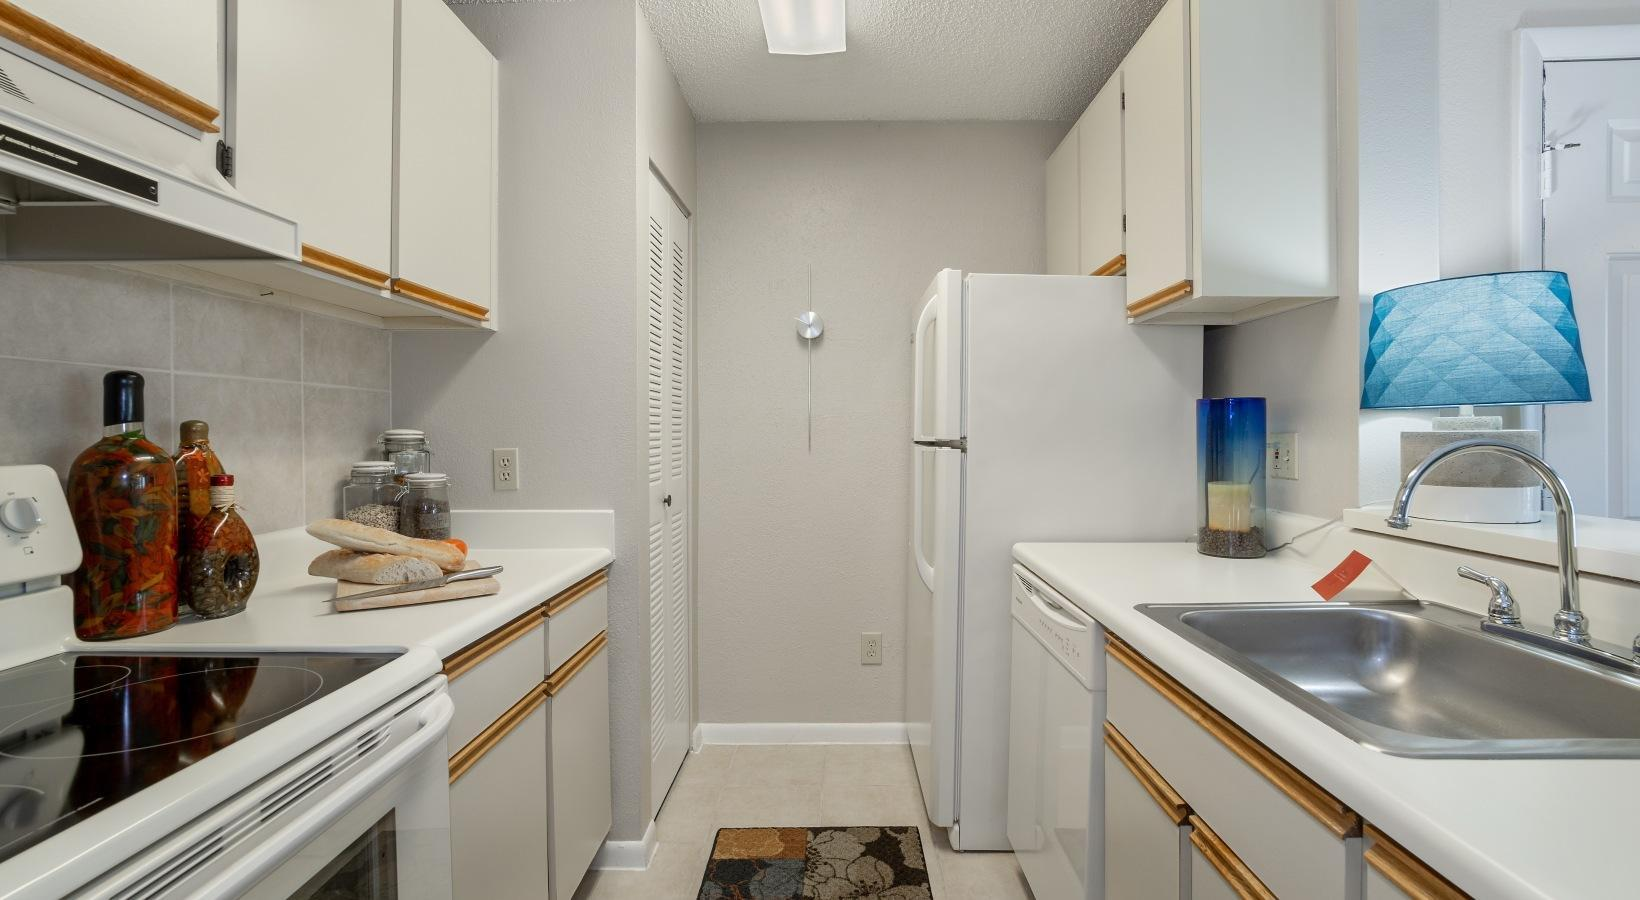 520 Terraceview Cove #17-208, Altamonte Springs, FL - 2,162 USD/ month